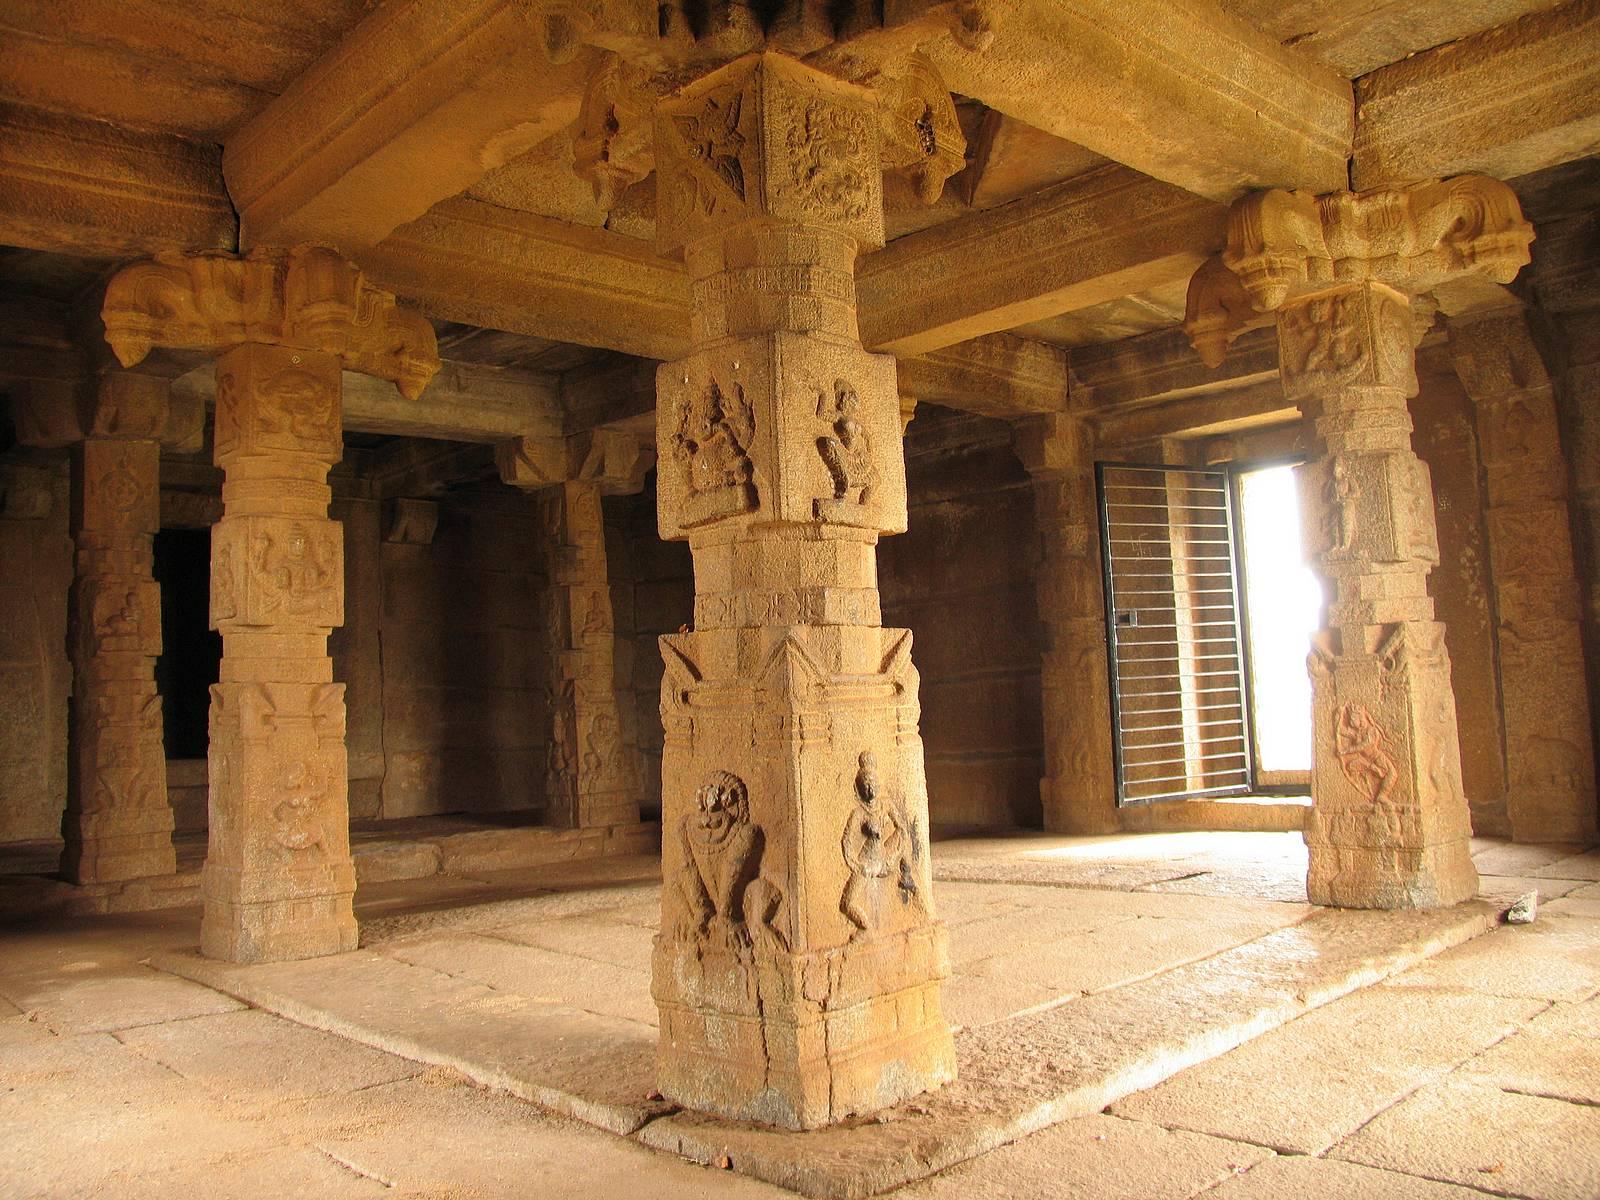 Hampi temple inside view - temples decoration Hampi